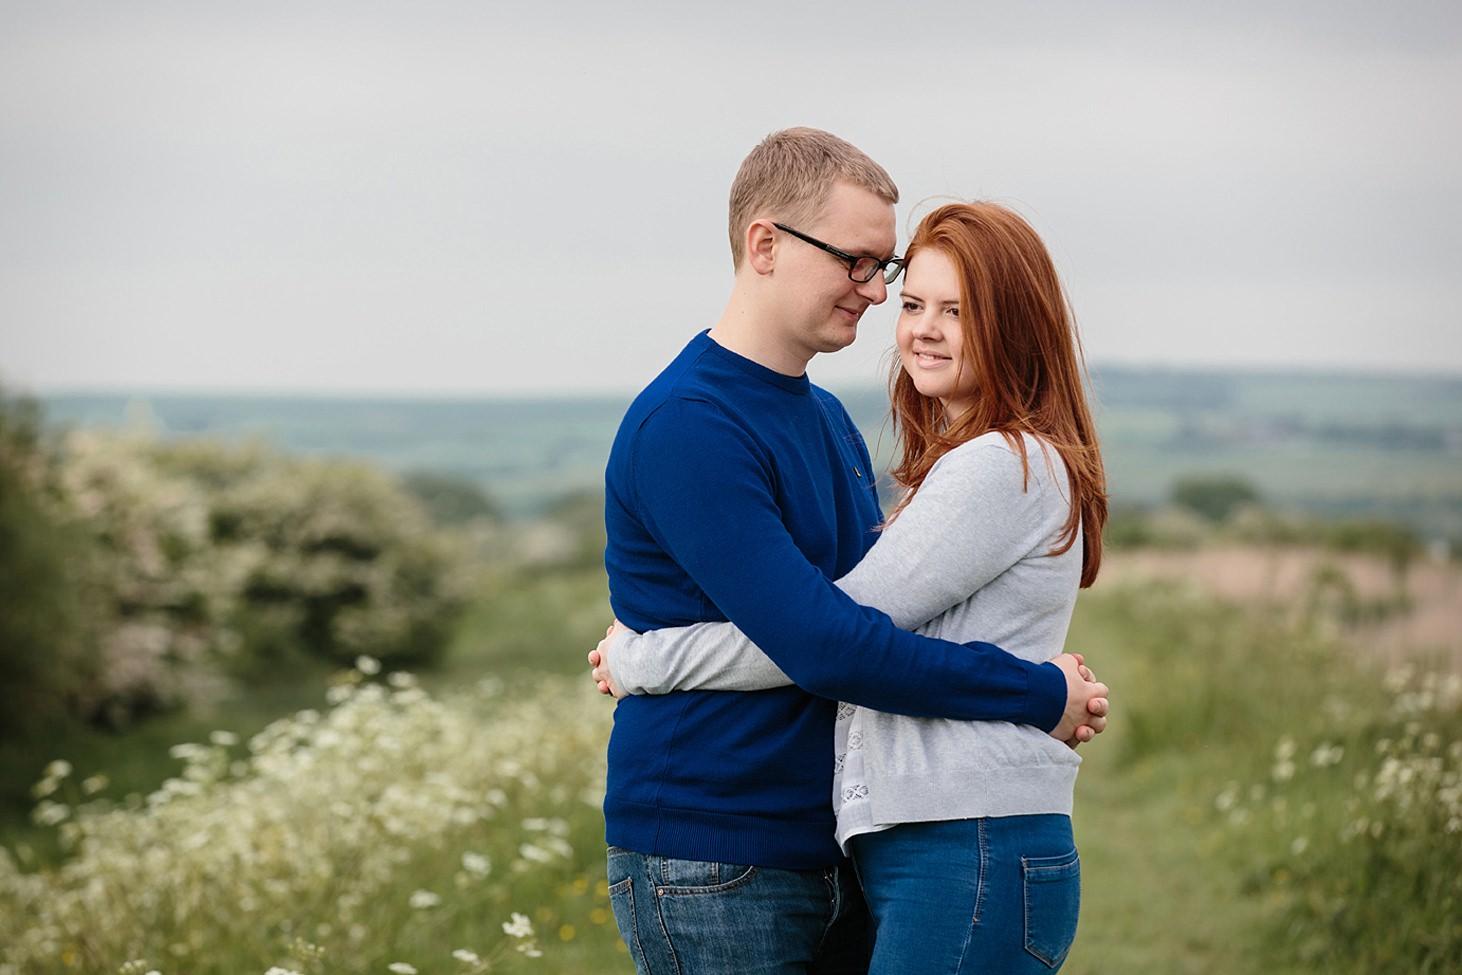 arundel engagement shoot hugging couple